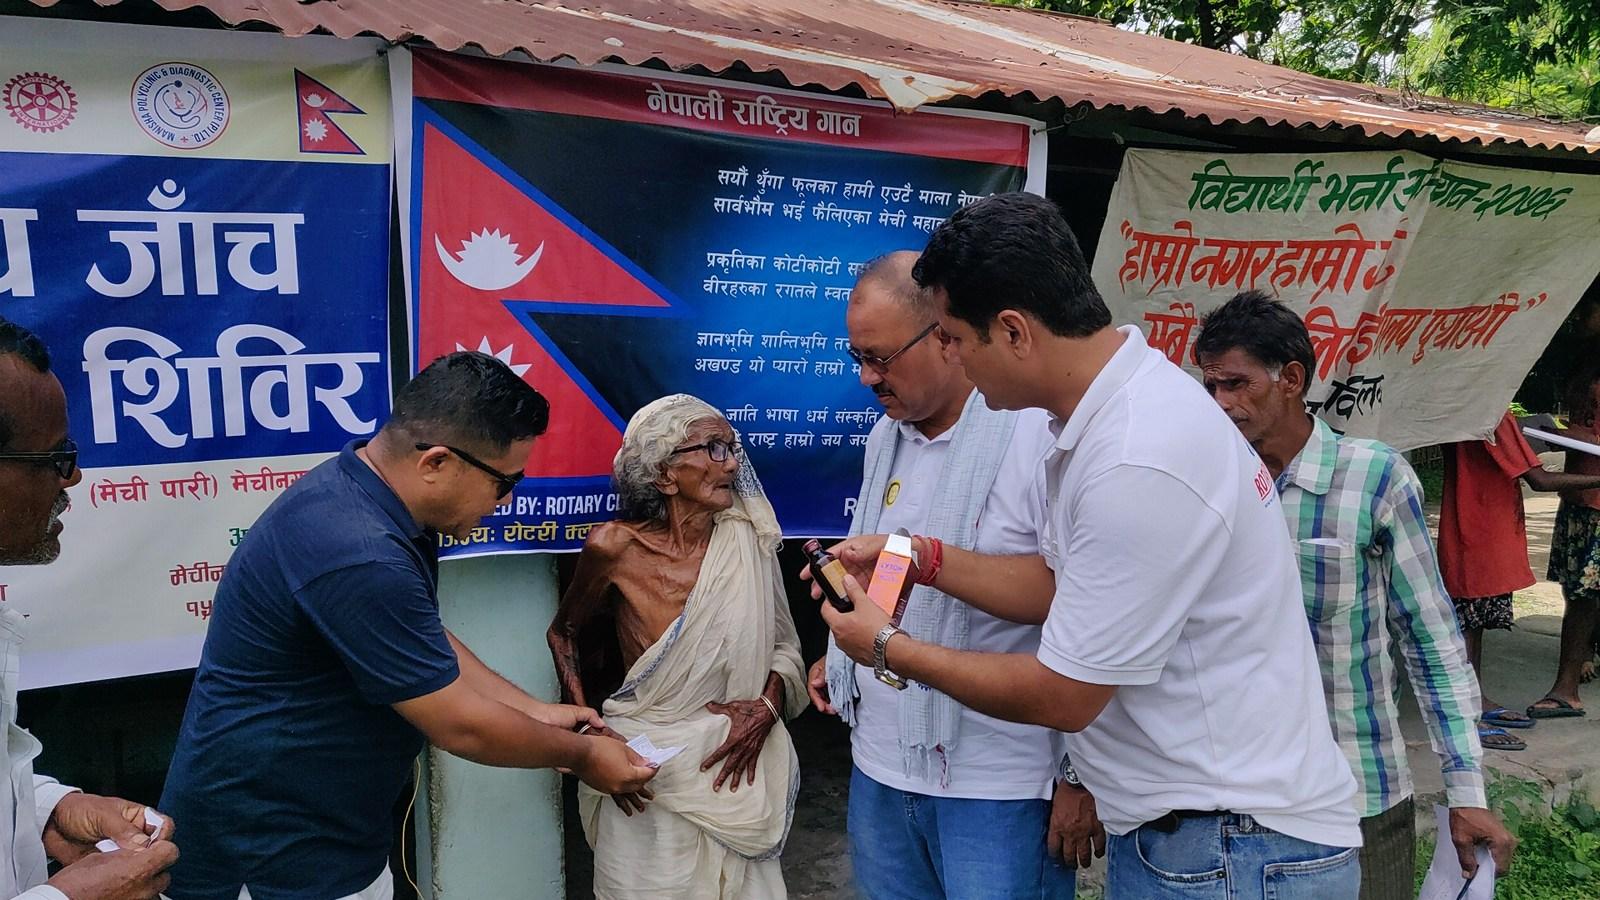 Free-Health-Camp-Eye-Screening-at-Gwala-Basti-Mechinagar-15-Jhapa-Nepal-Rotary-Club-of-Kakarvitta-37